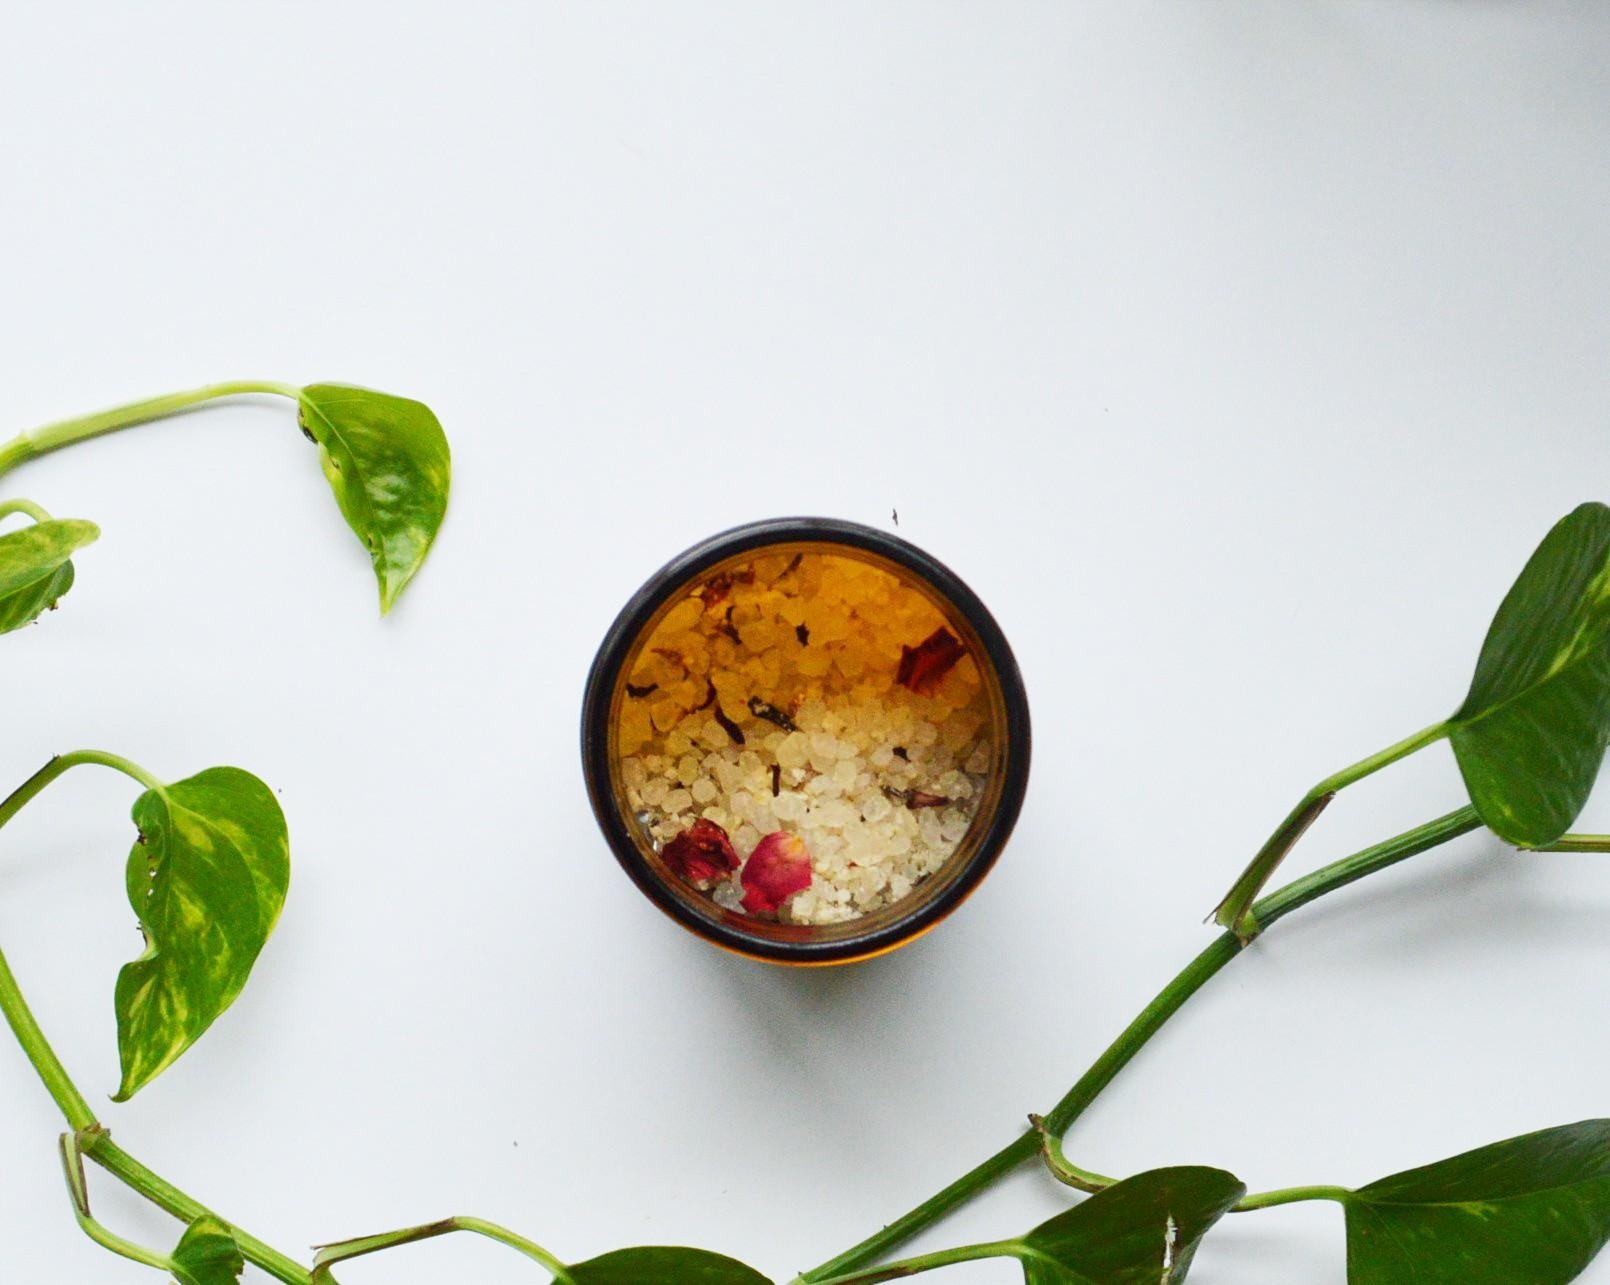 Lavami Floral Bath Soak Review